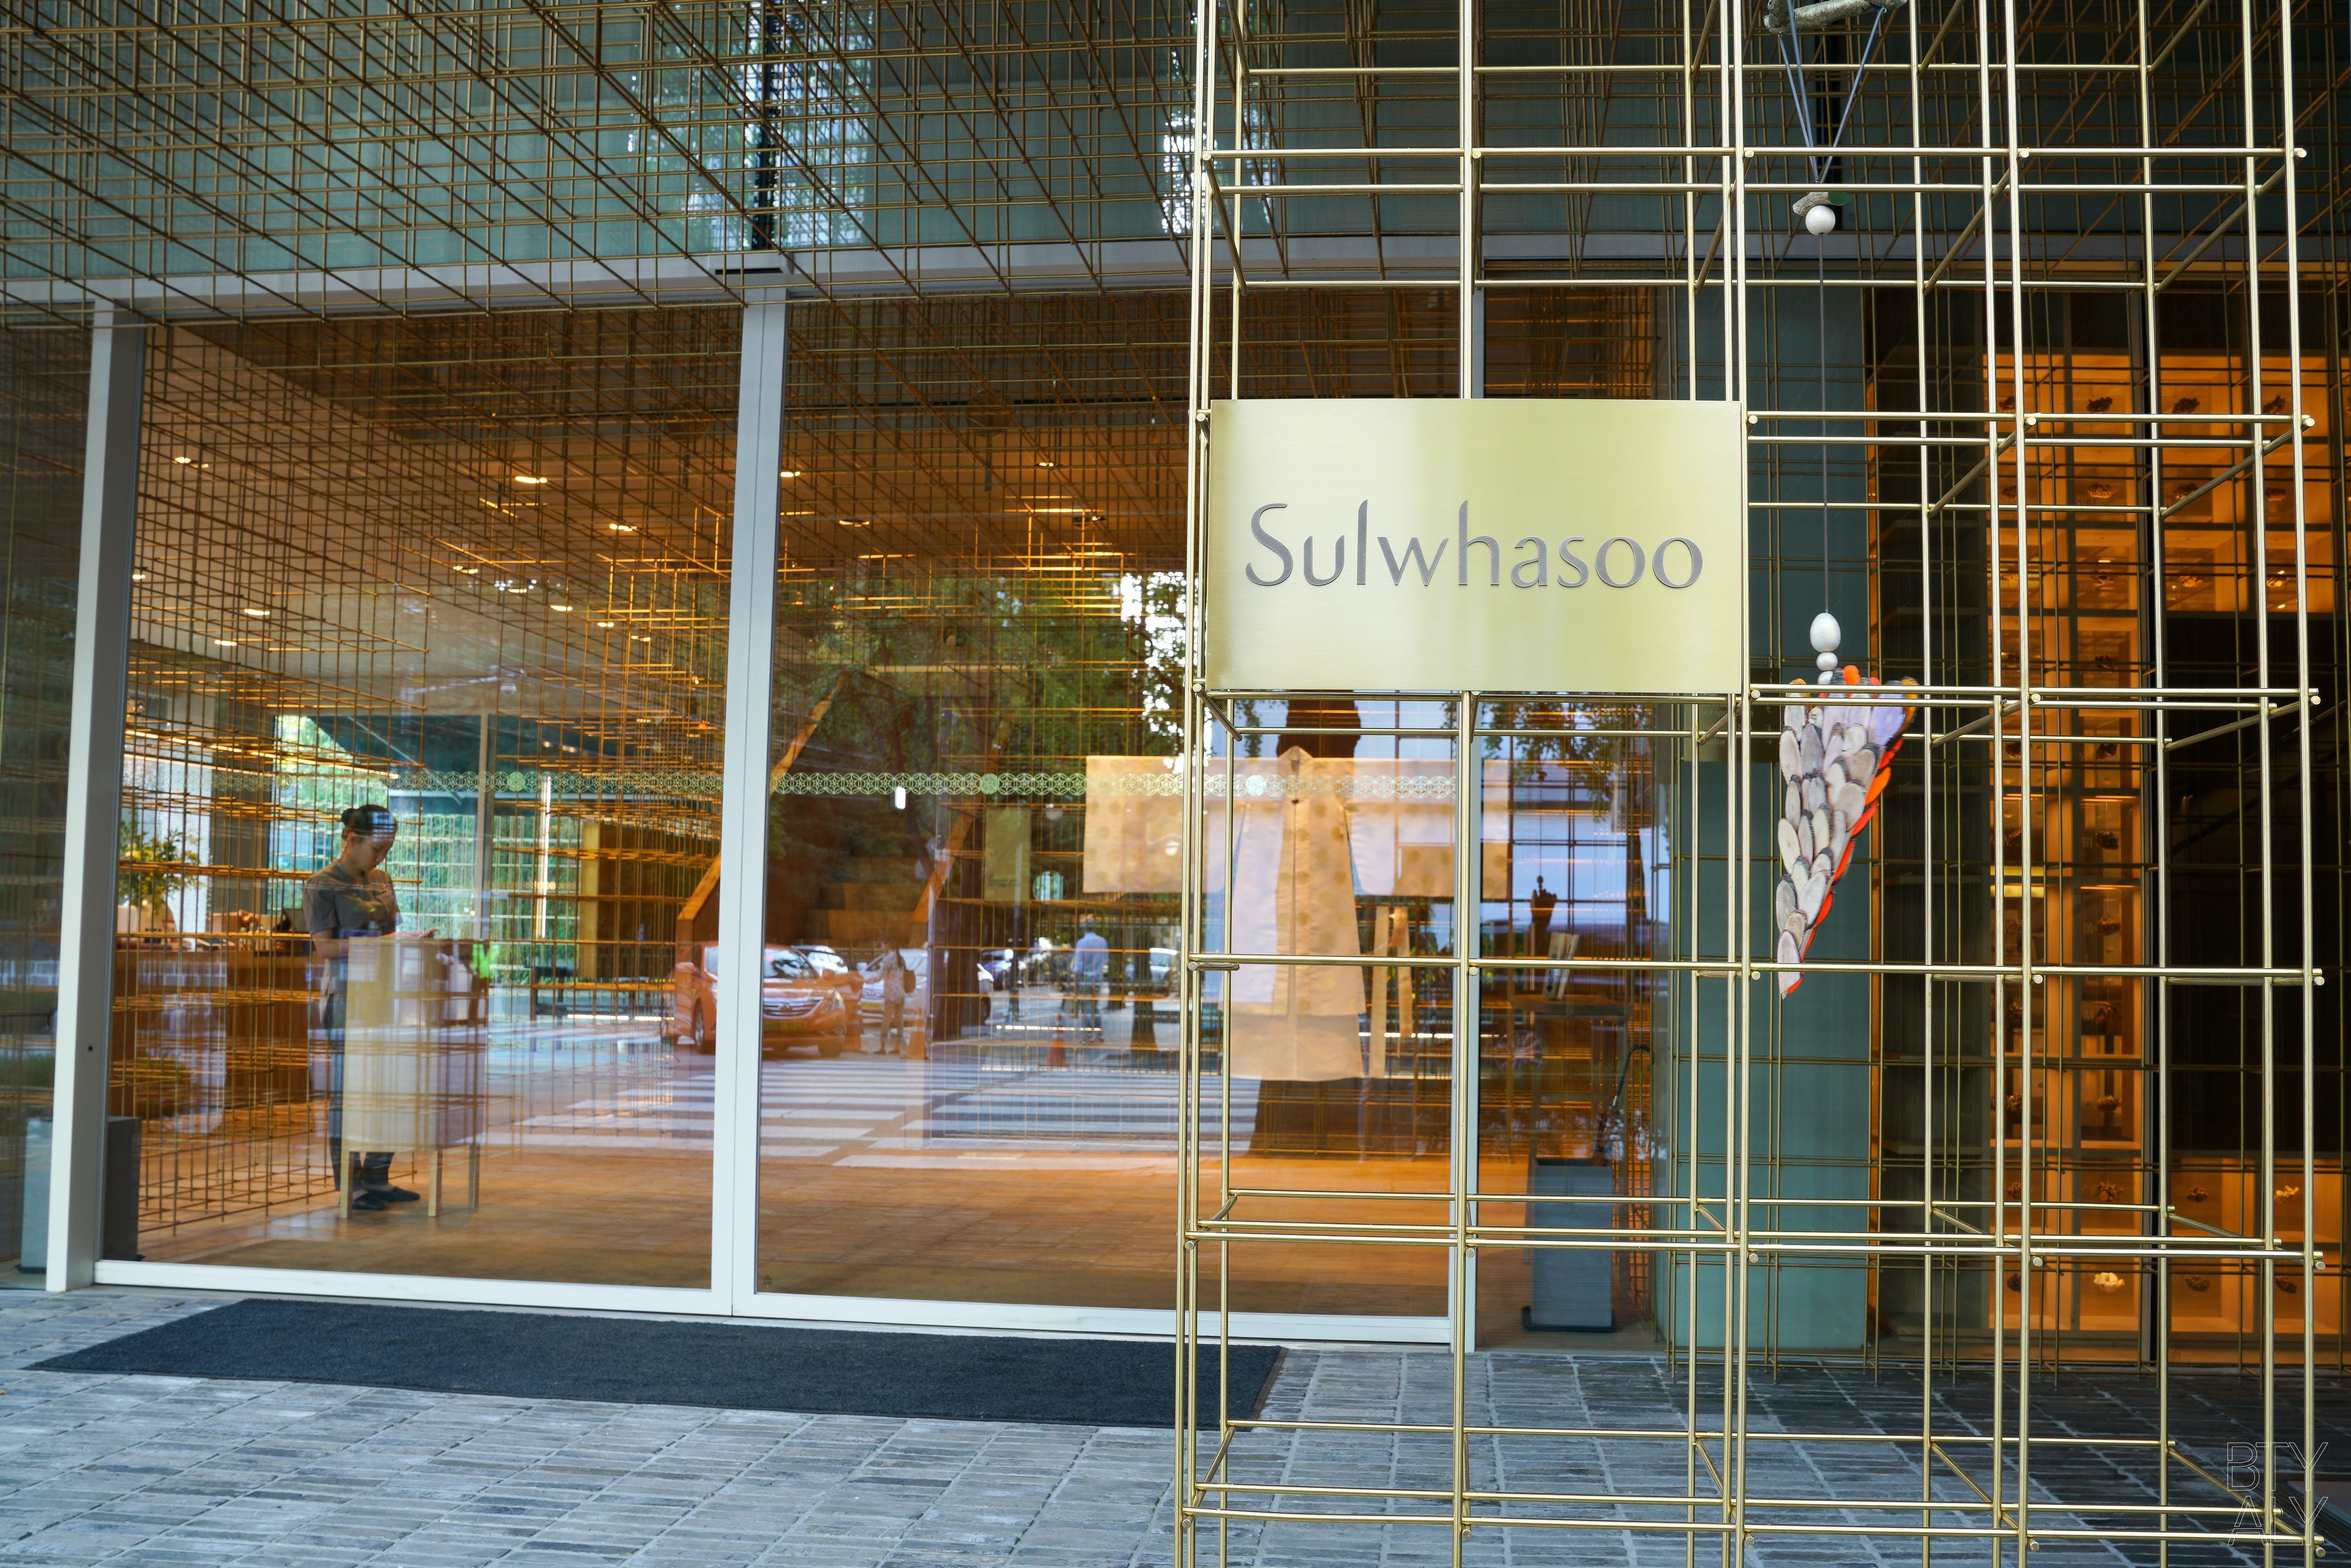 Sulwhasoo flagship store Seoul South Korea entrance